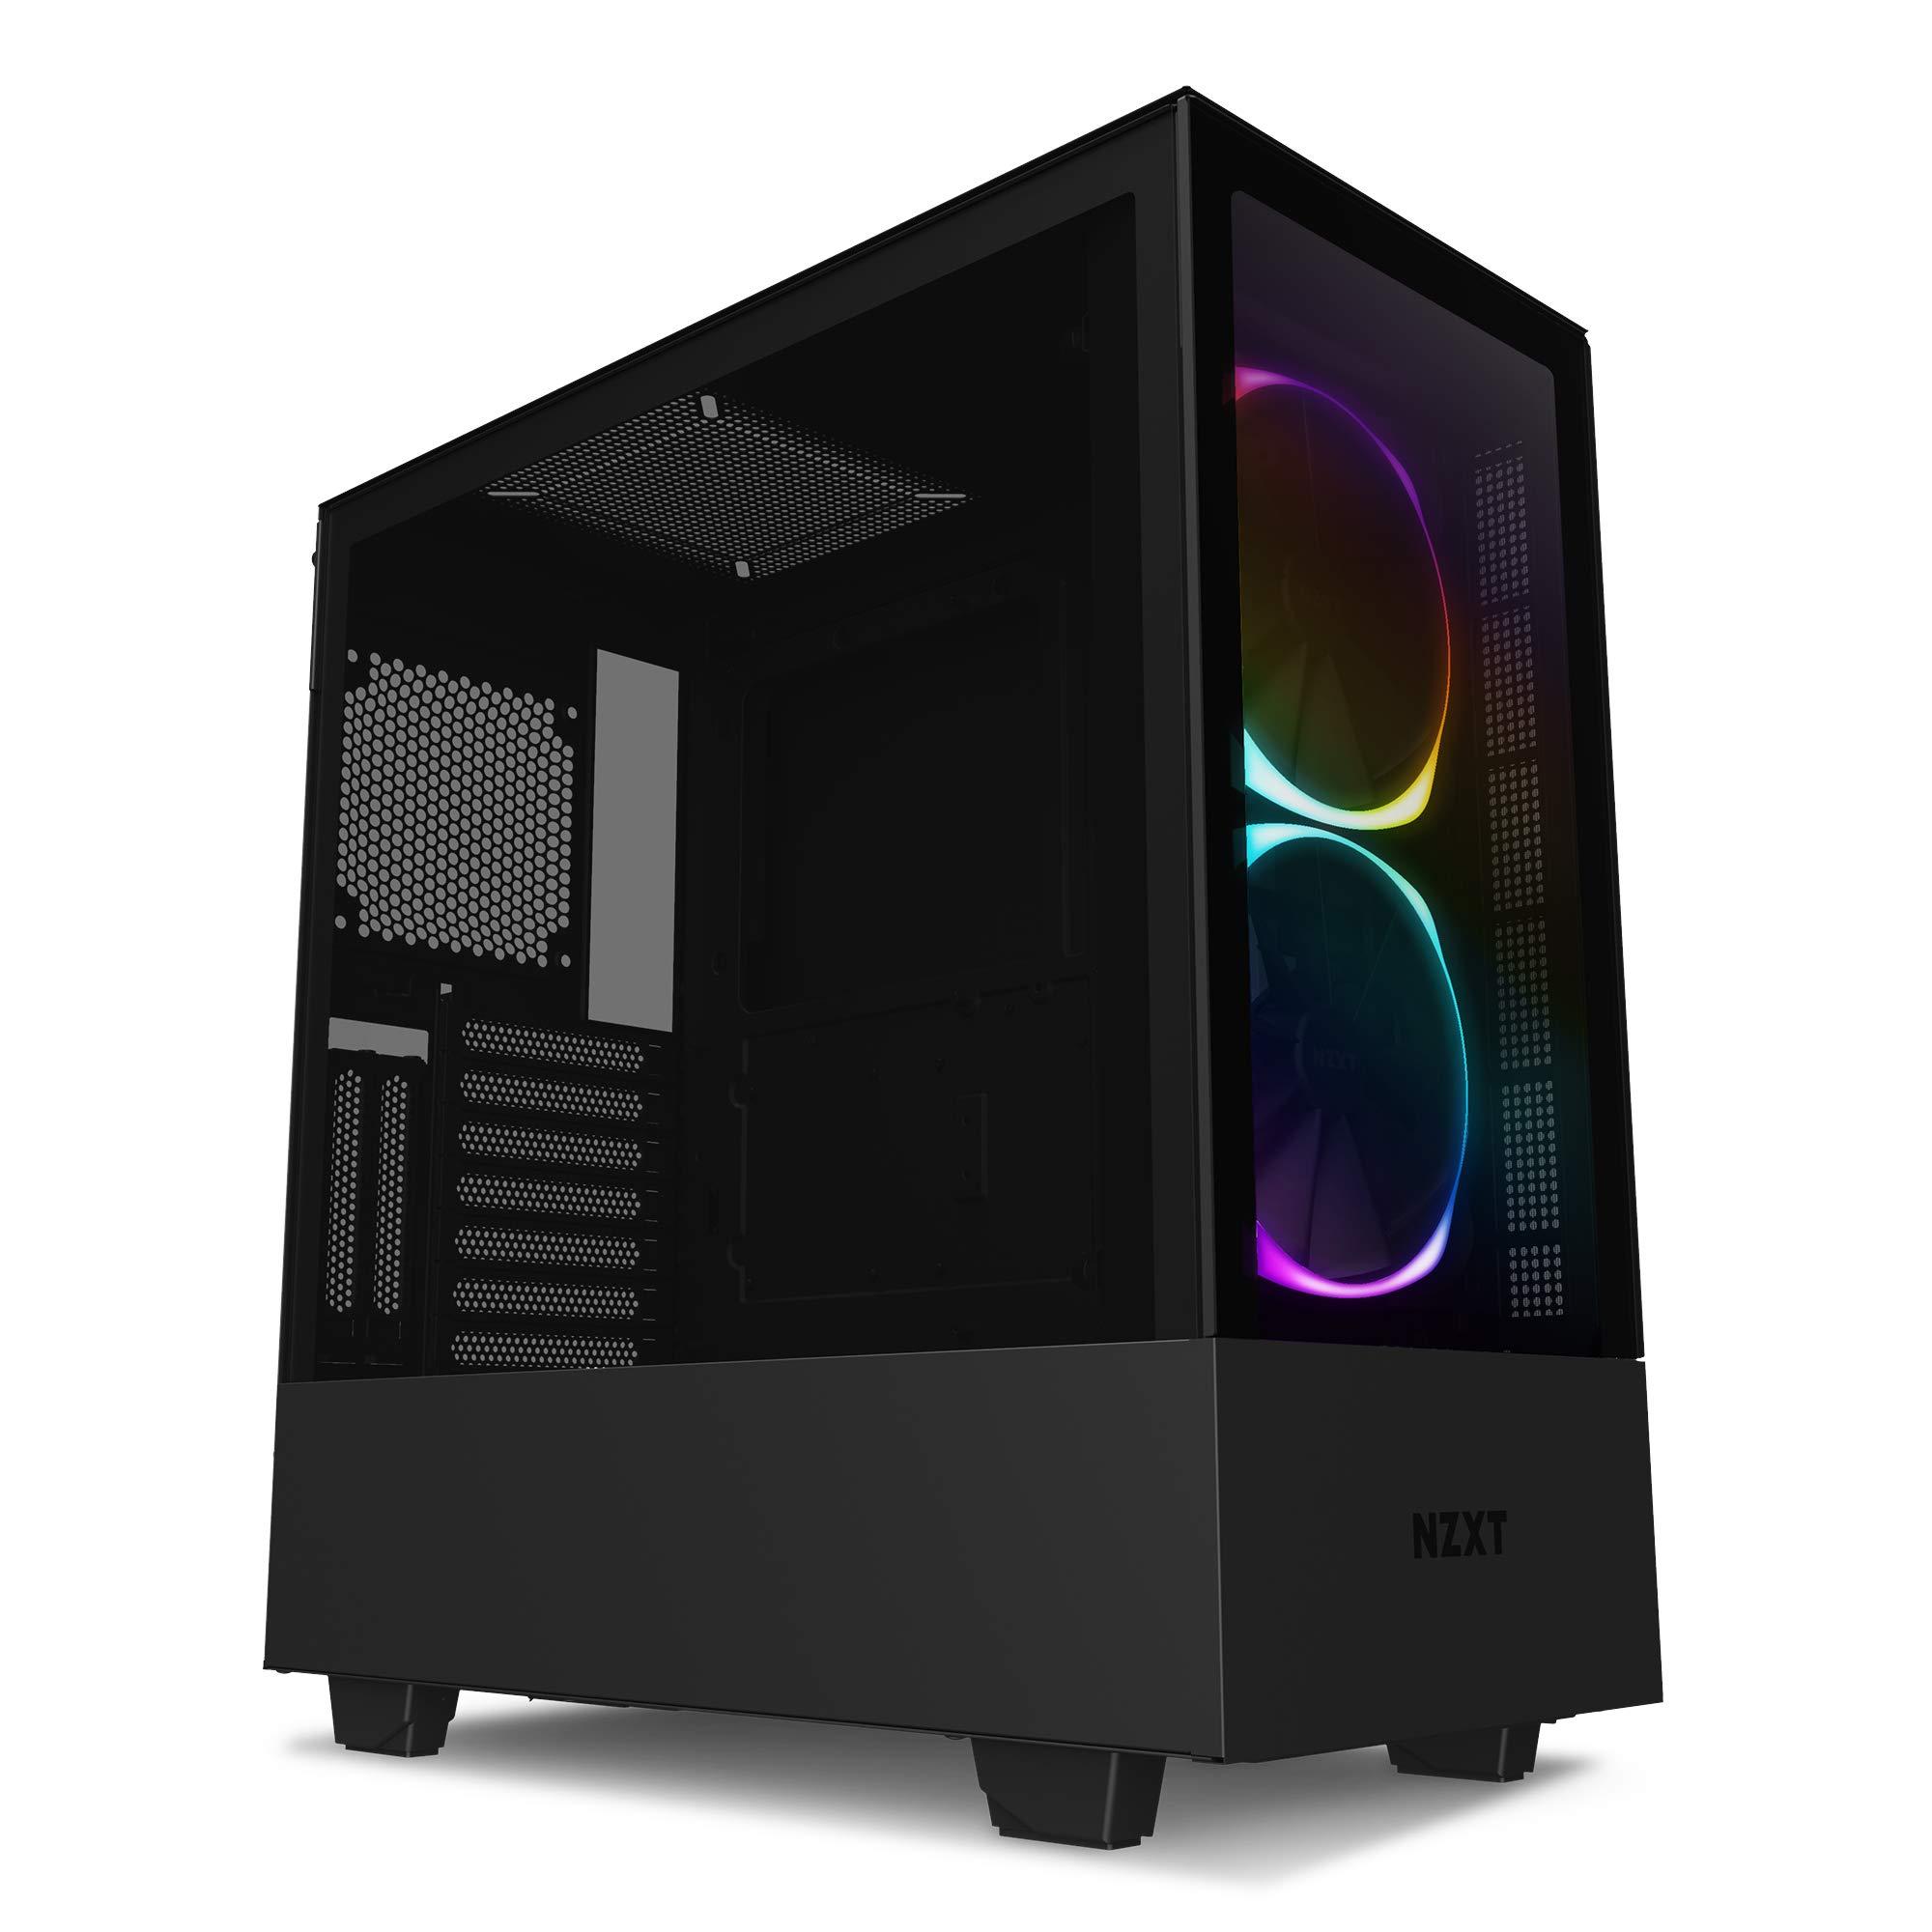 NZXT H510 Elite - Caja PC Gaming Semitorre Premium ATX - Doble Panel de Cristal Templado - Panel frontal